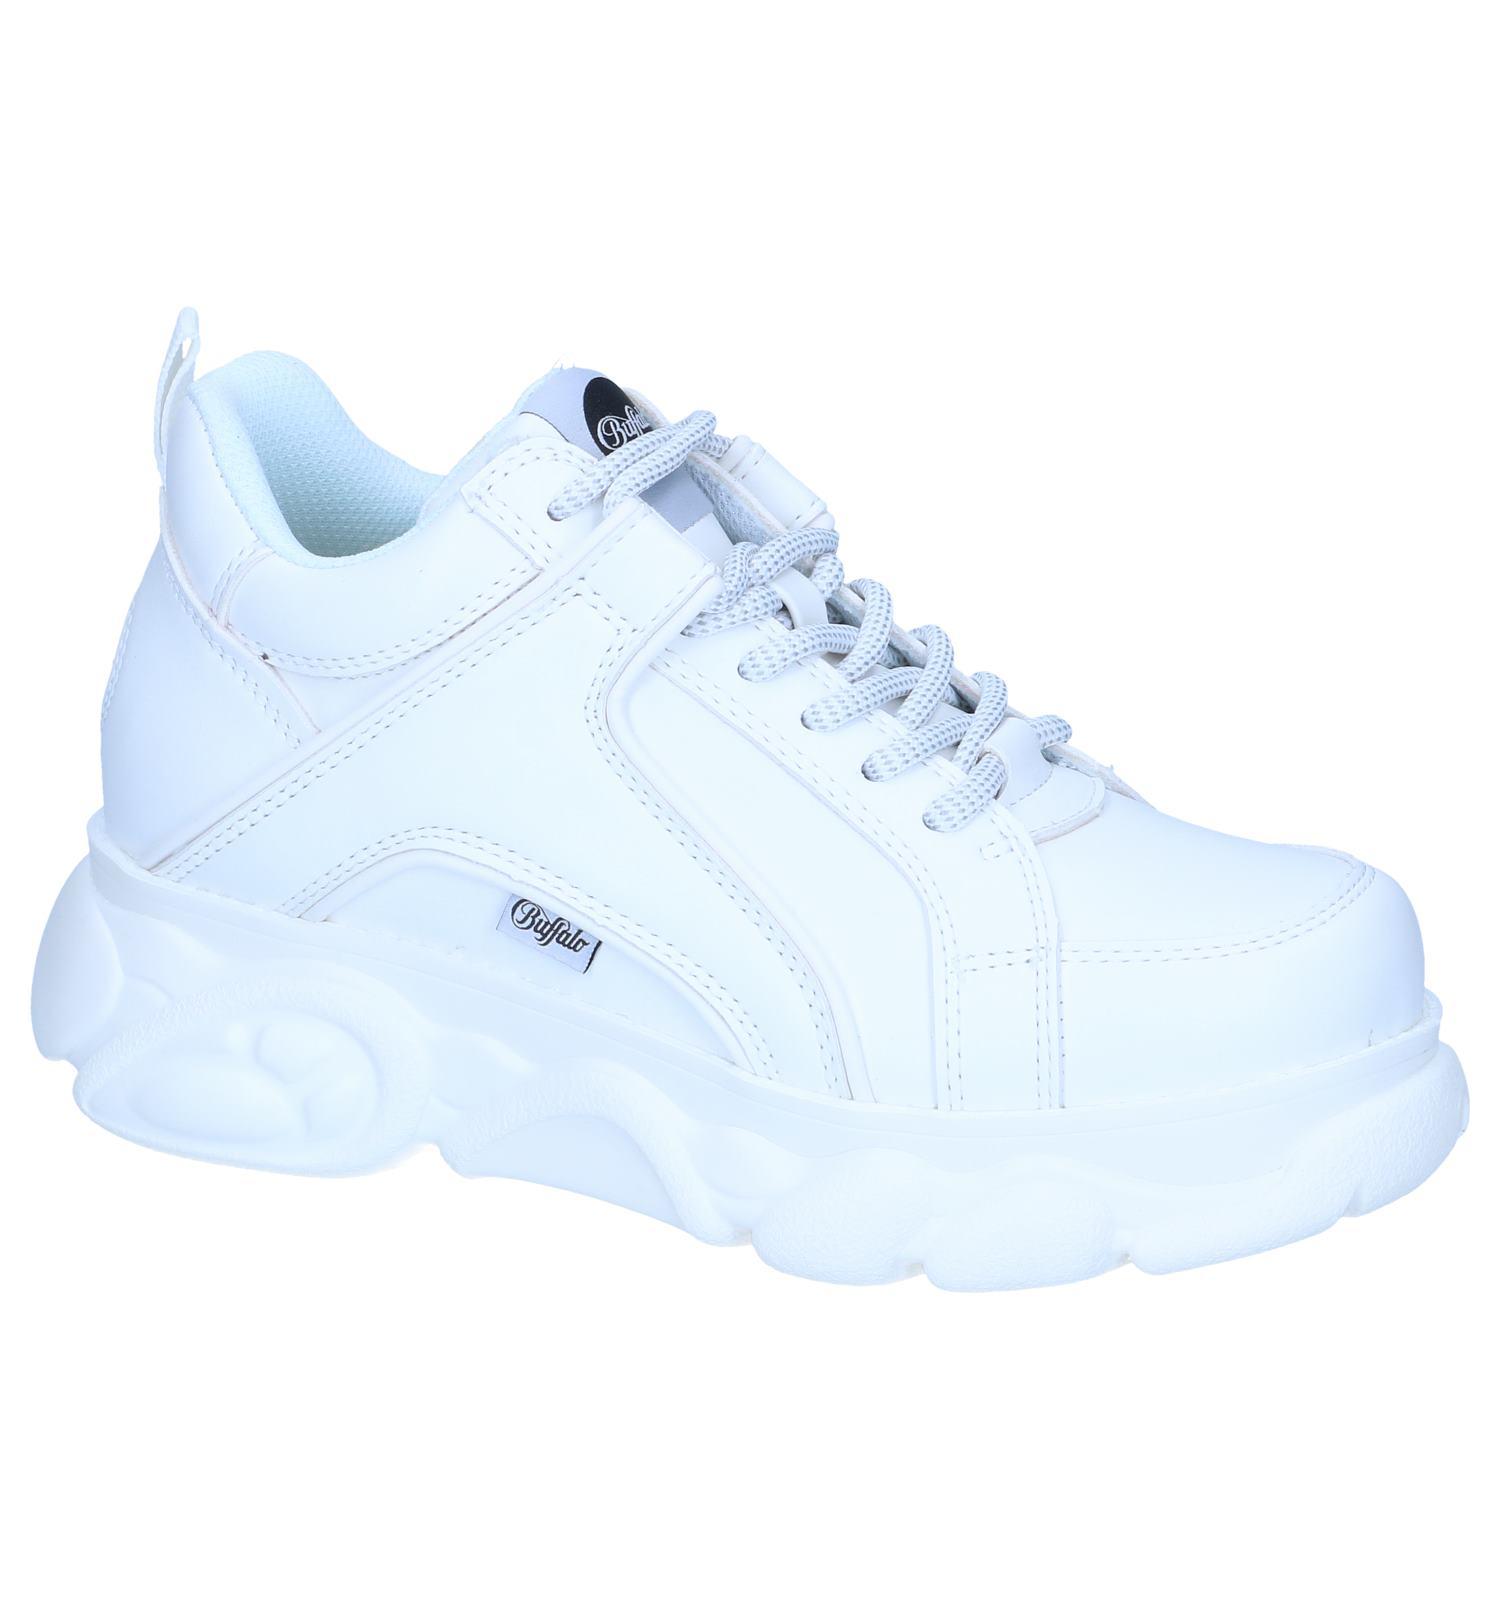 18fbe0411c8 Witte Lage Sneakers Buffalo Corin | TORFS.BE | Gratis verzend en retour